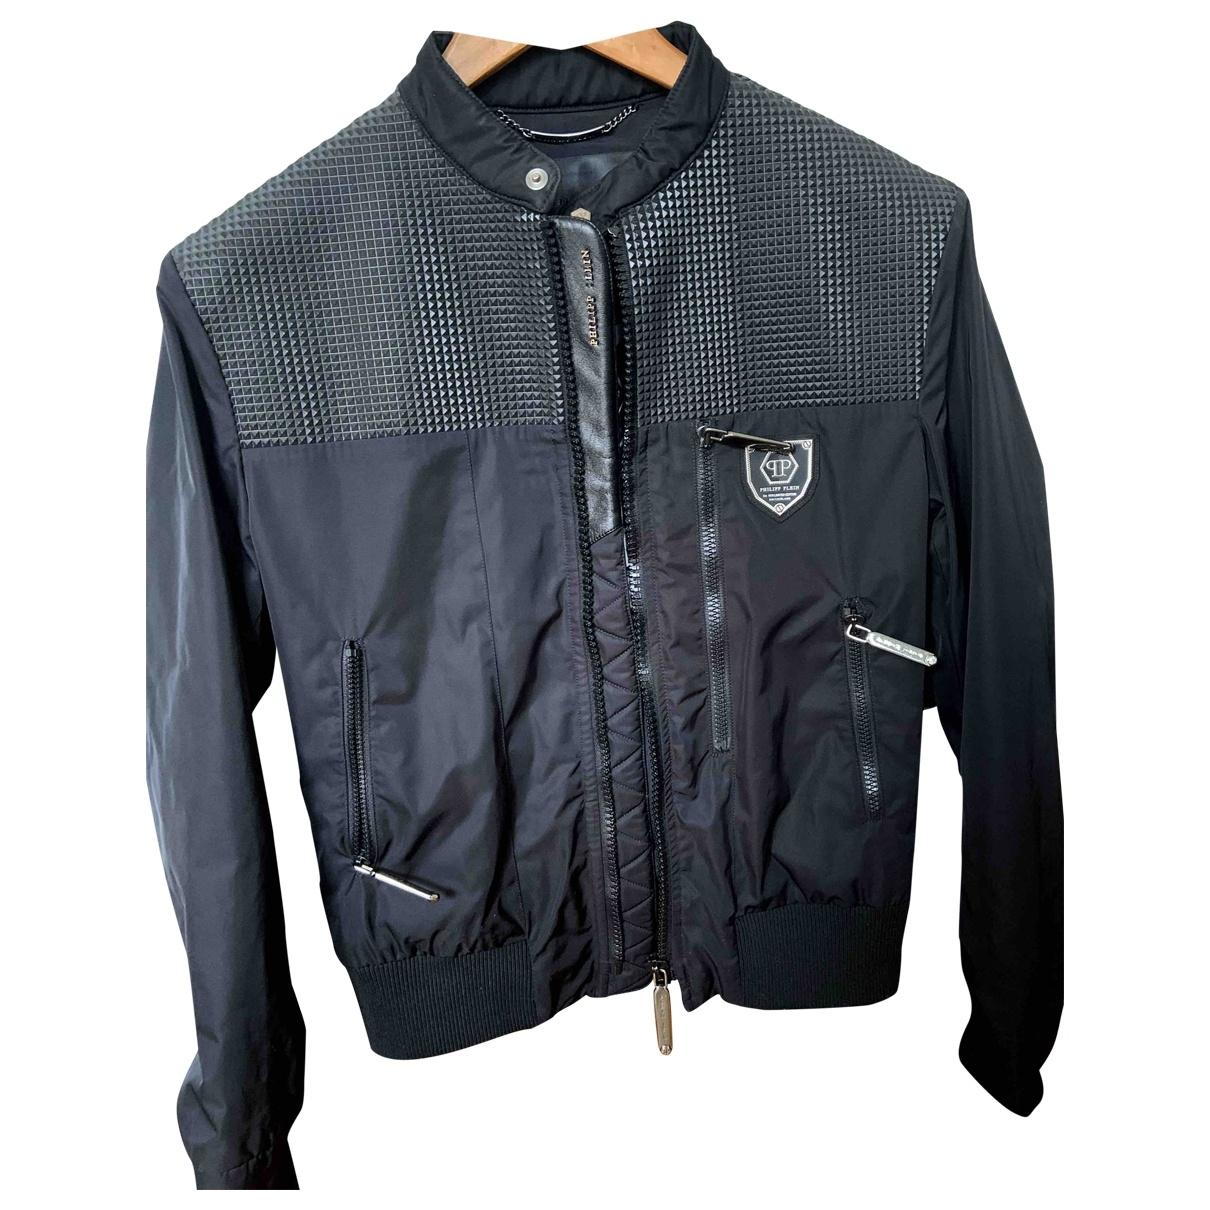 Philipp Plein \N Black jacket  for Men 36 UK - US